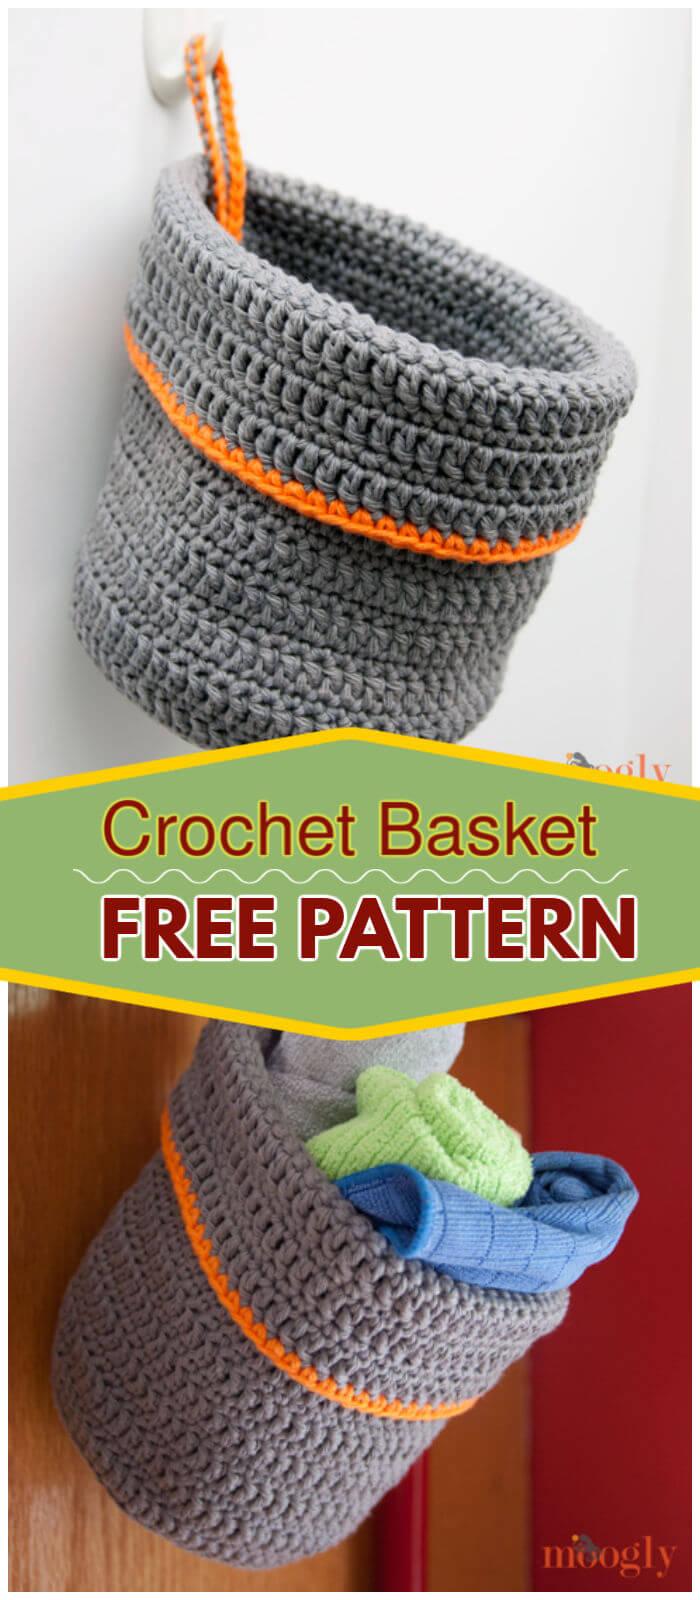 How to Crochet Basket Free Pattern